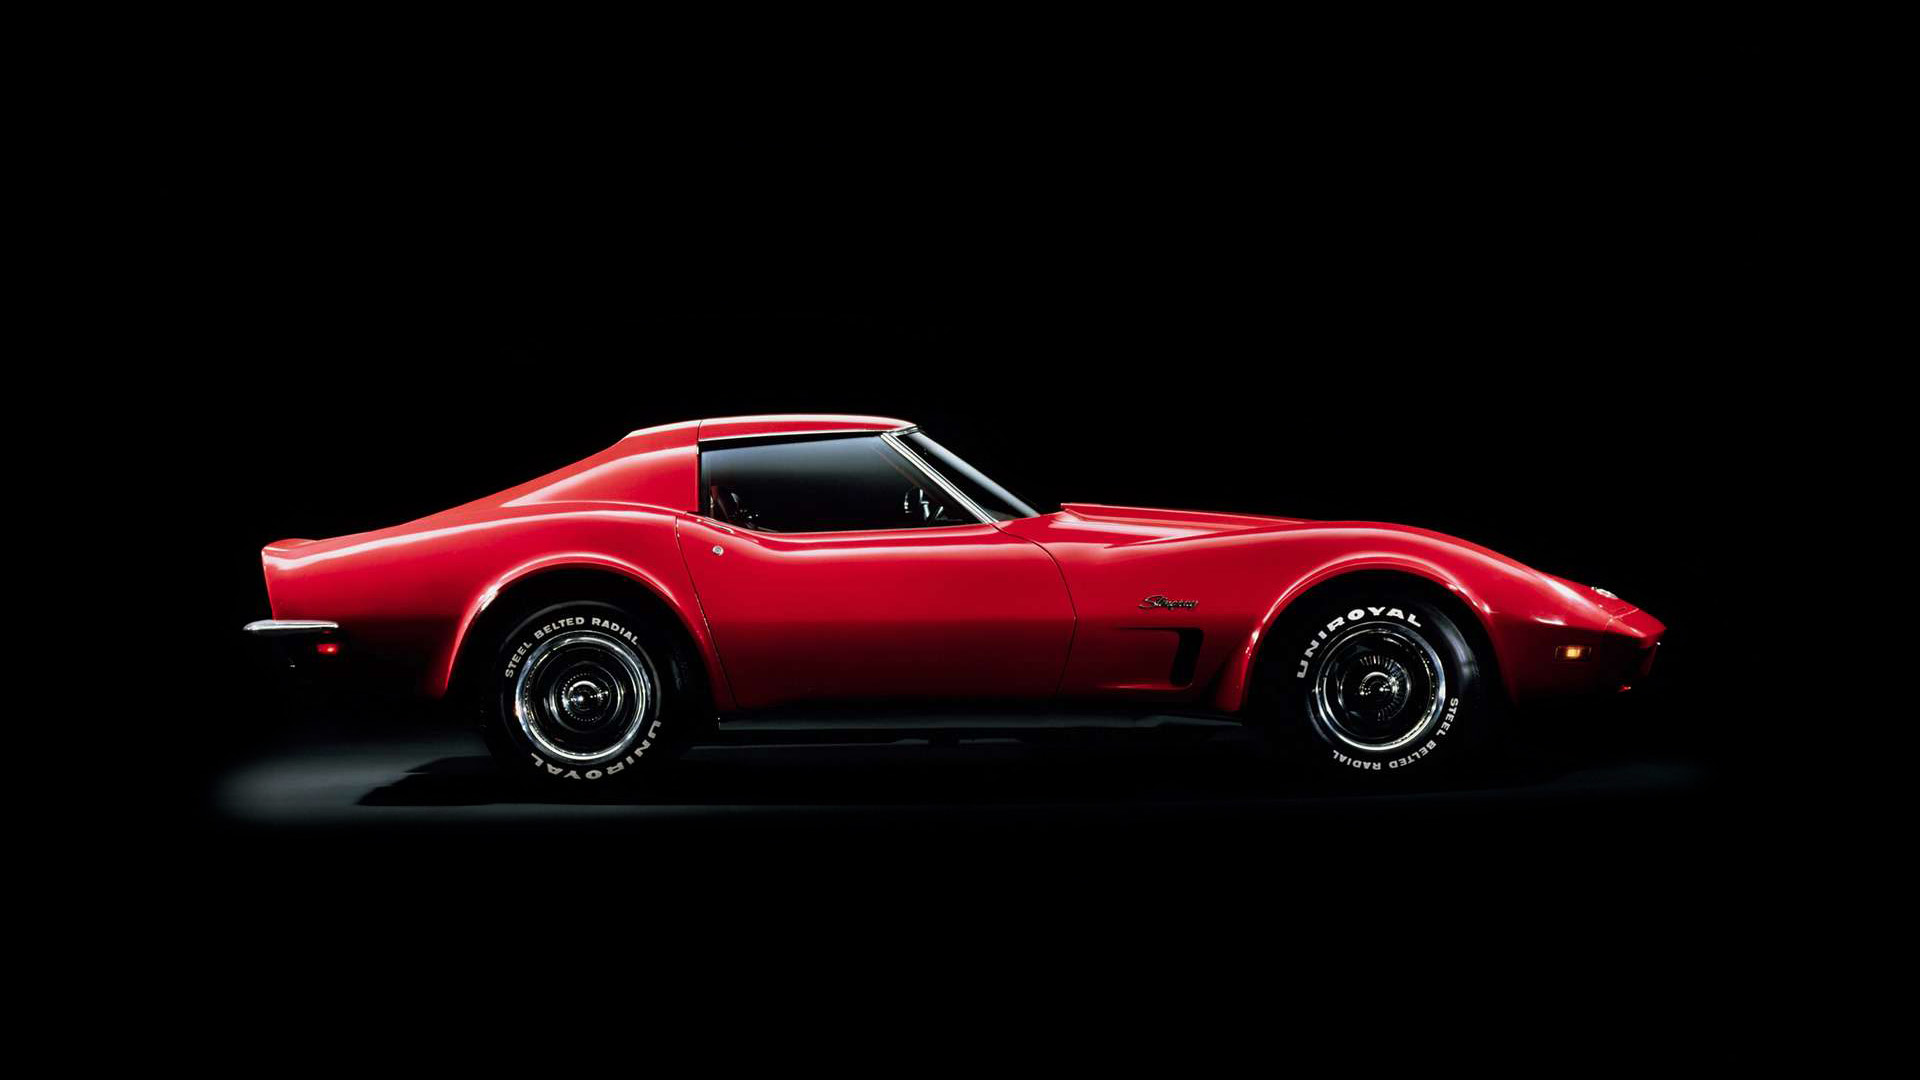 Corvette Stingray 1969 >> C3 Corvette Wallpaper - WallpaperSafari